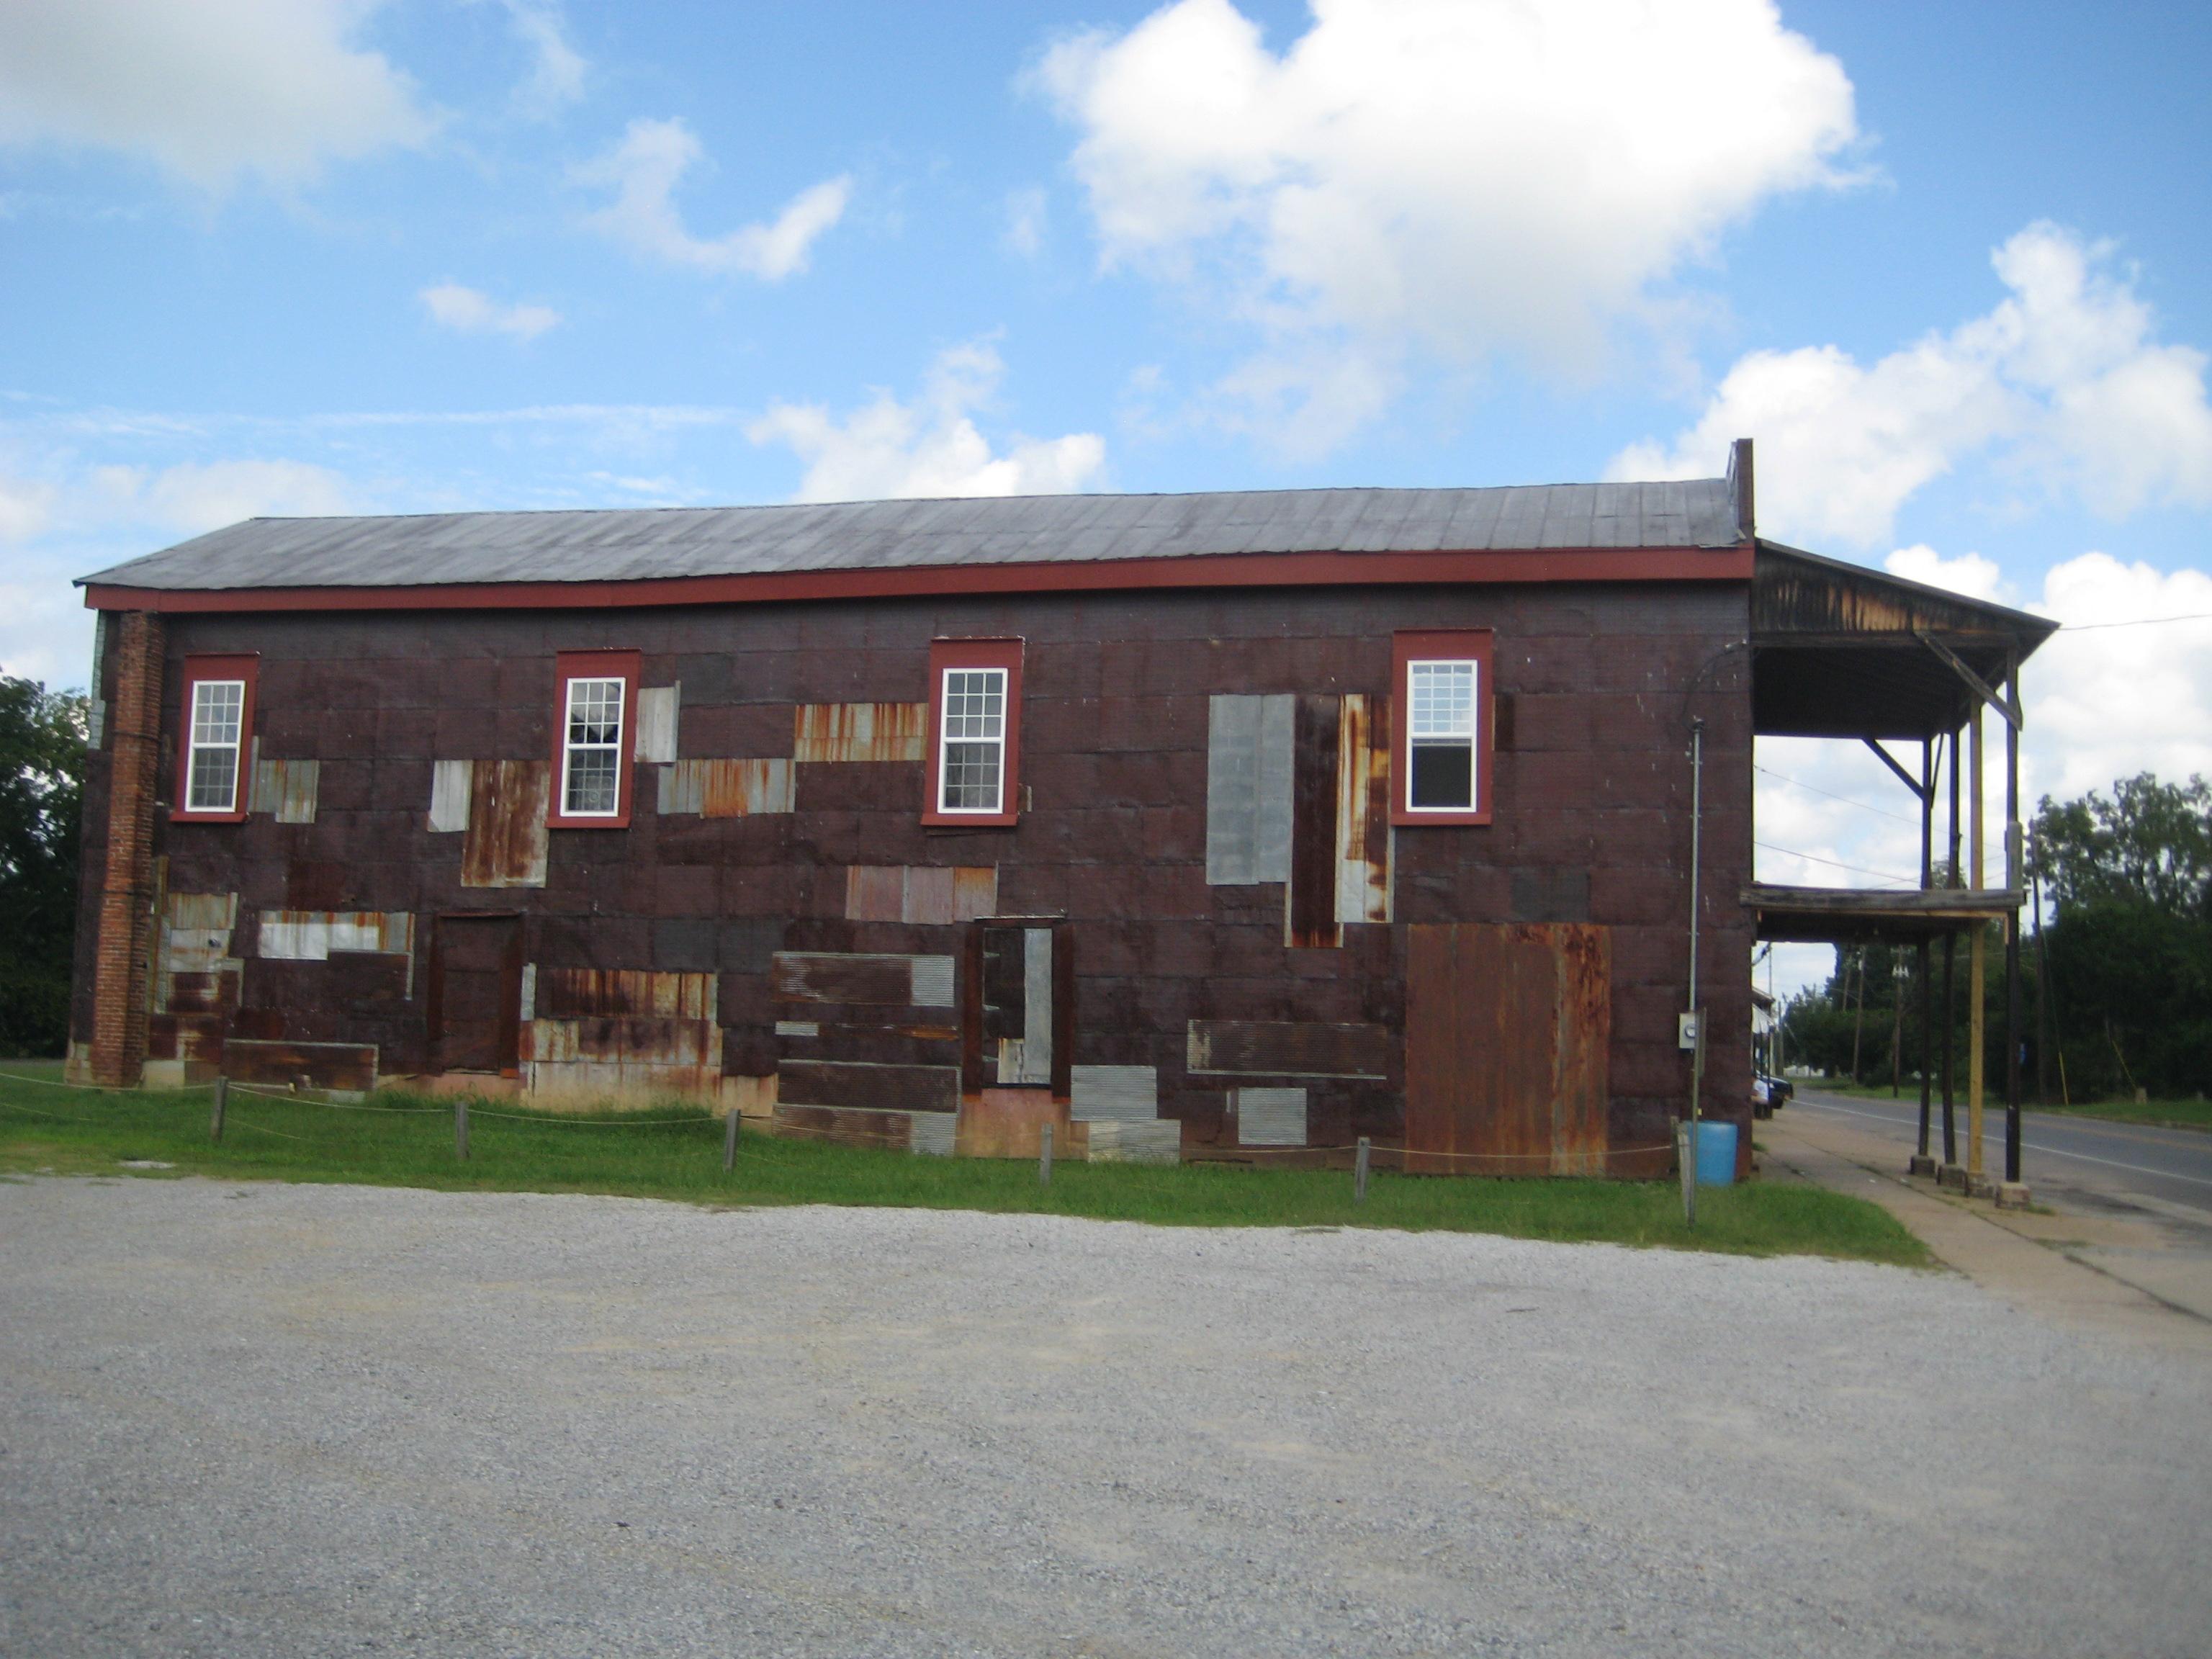 Big Red Barn at Rural Studio Newbern Alabama